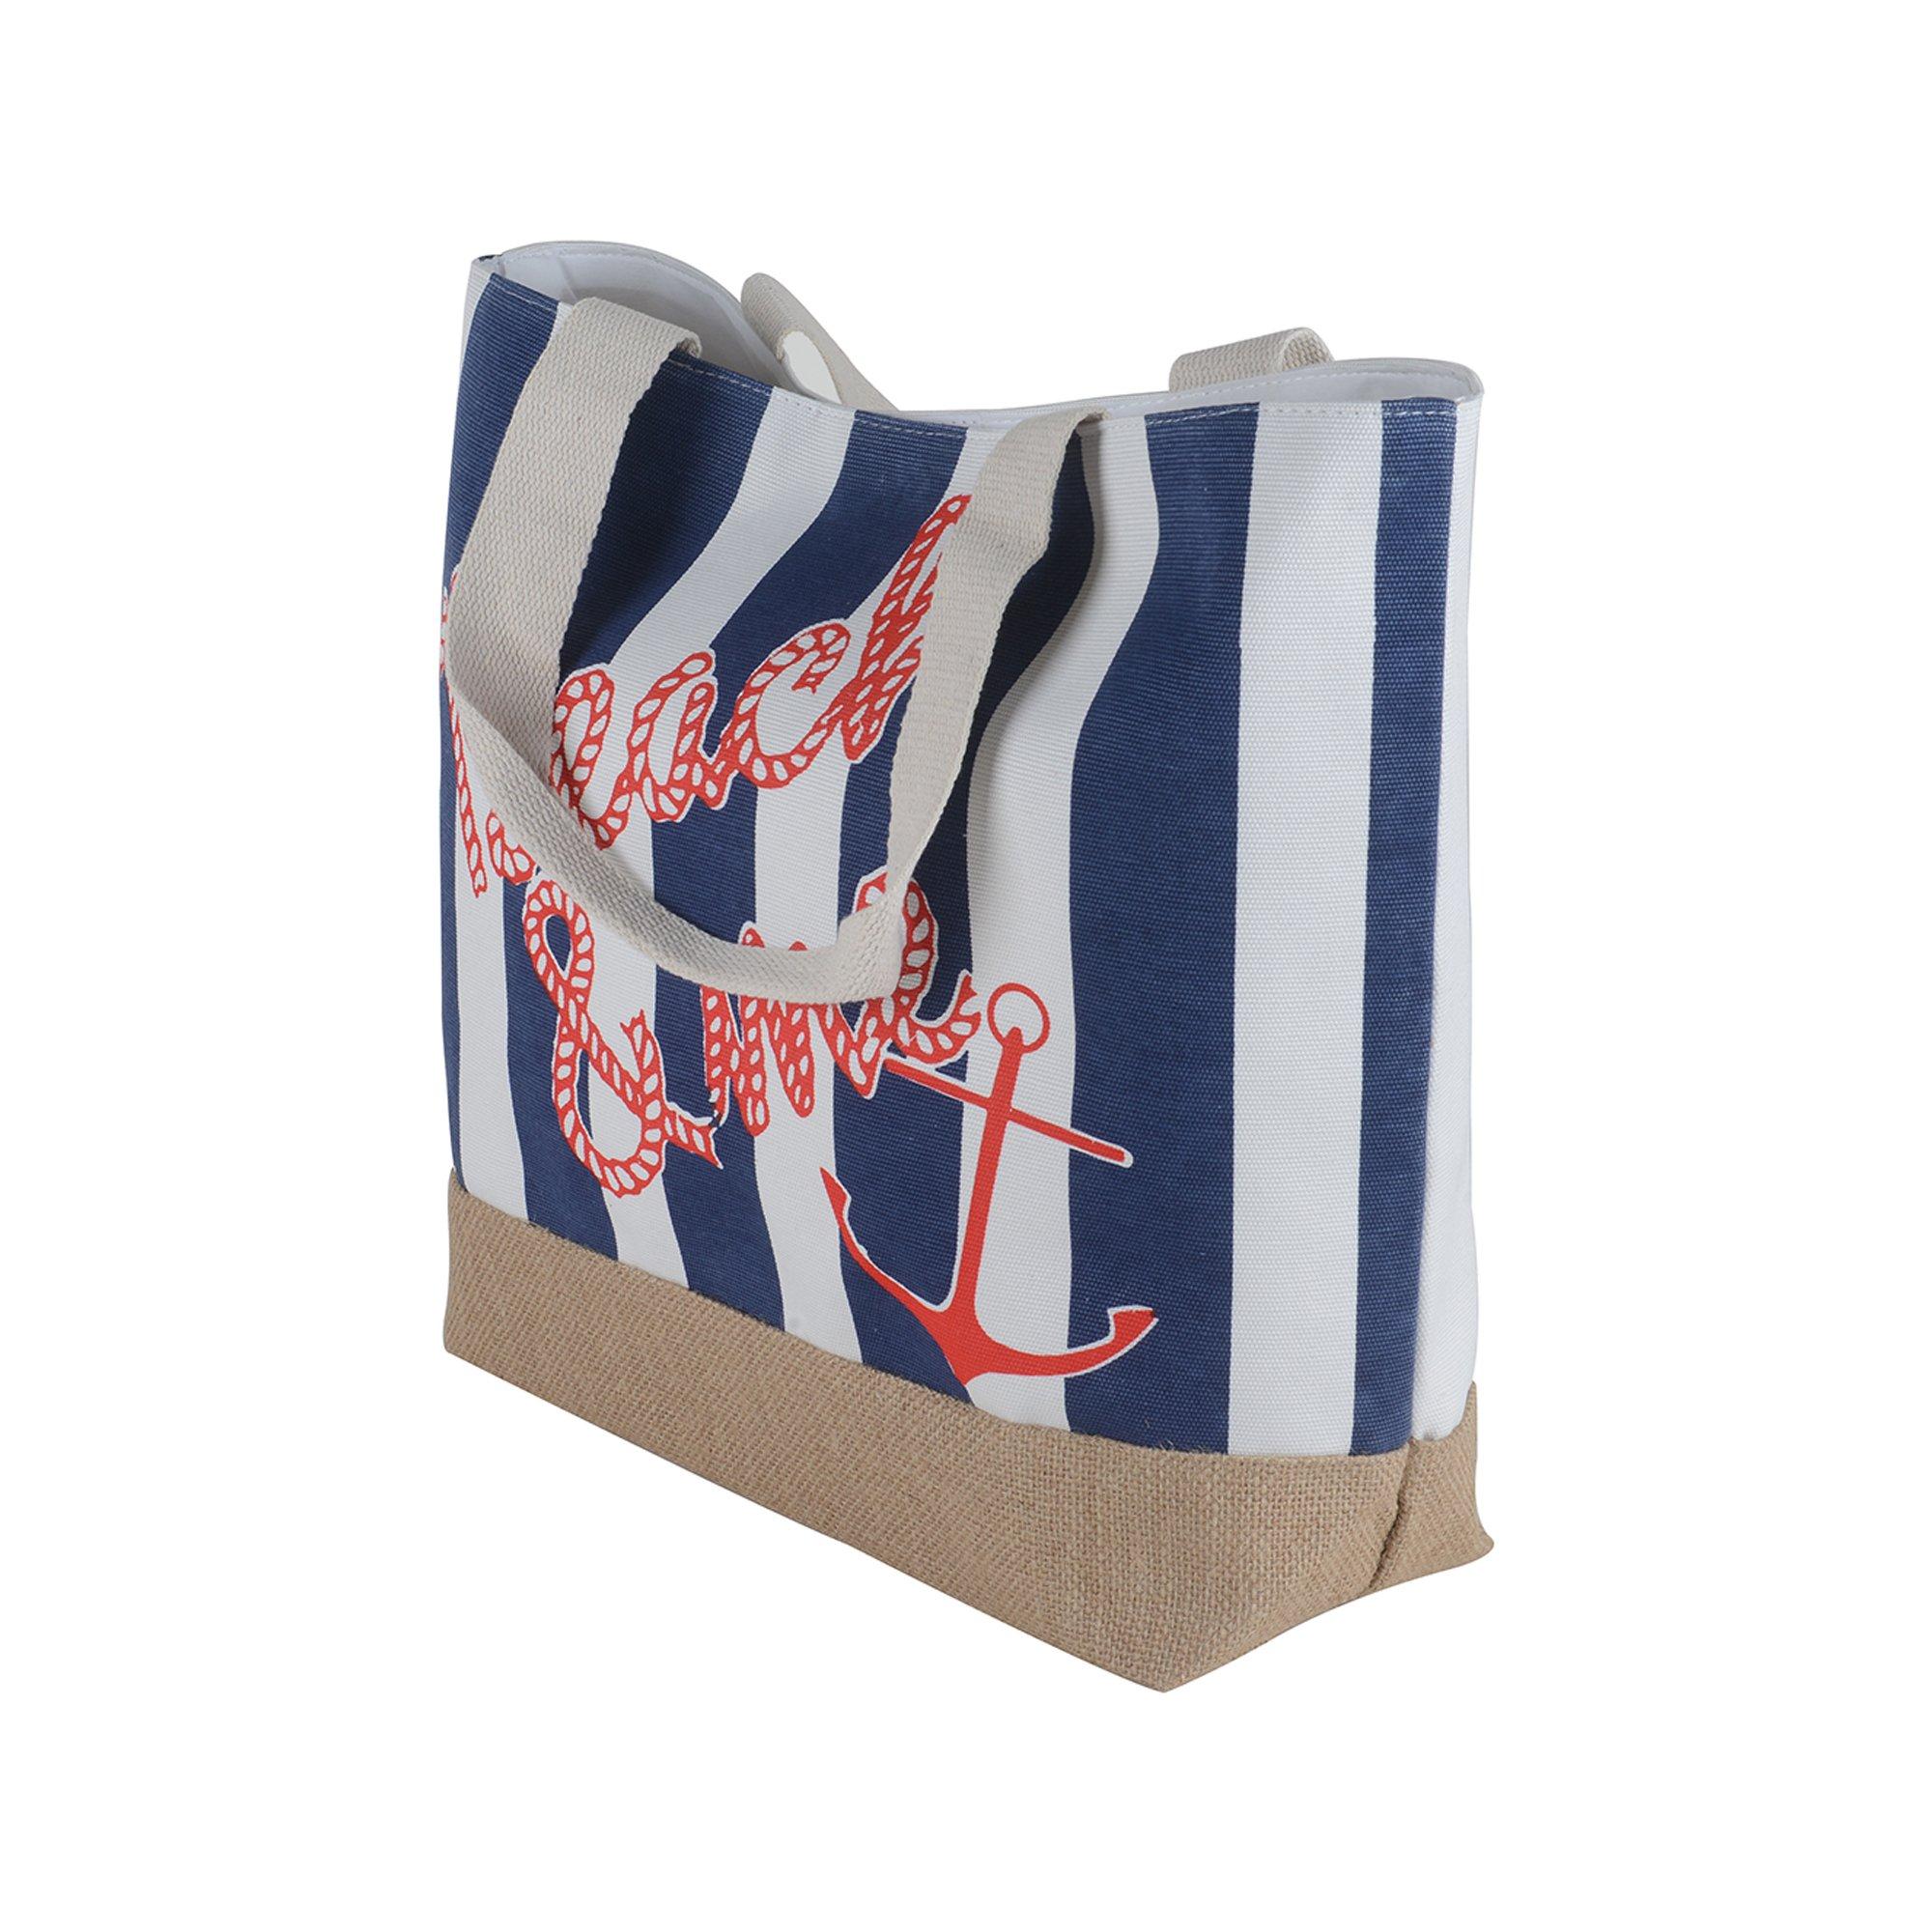 Canvas Burlap Beach & Me Printed Cotton Heavy Shoulder Straps Premium Women Tote Bag by BB (Navy Blue) by BB (Image #2)